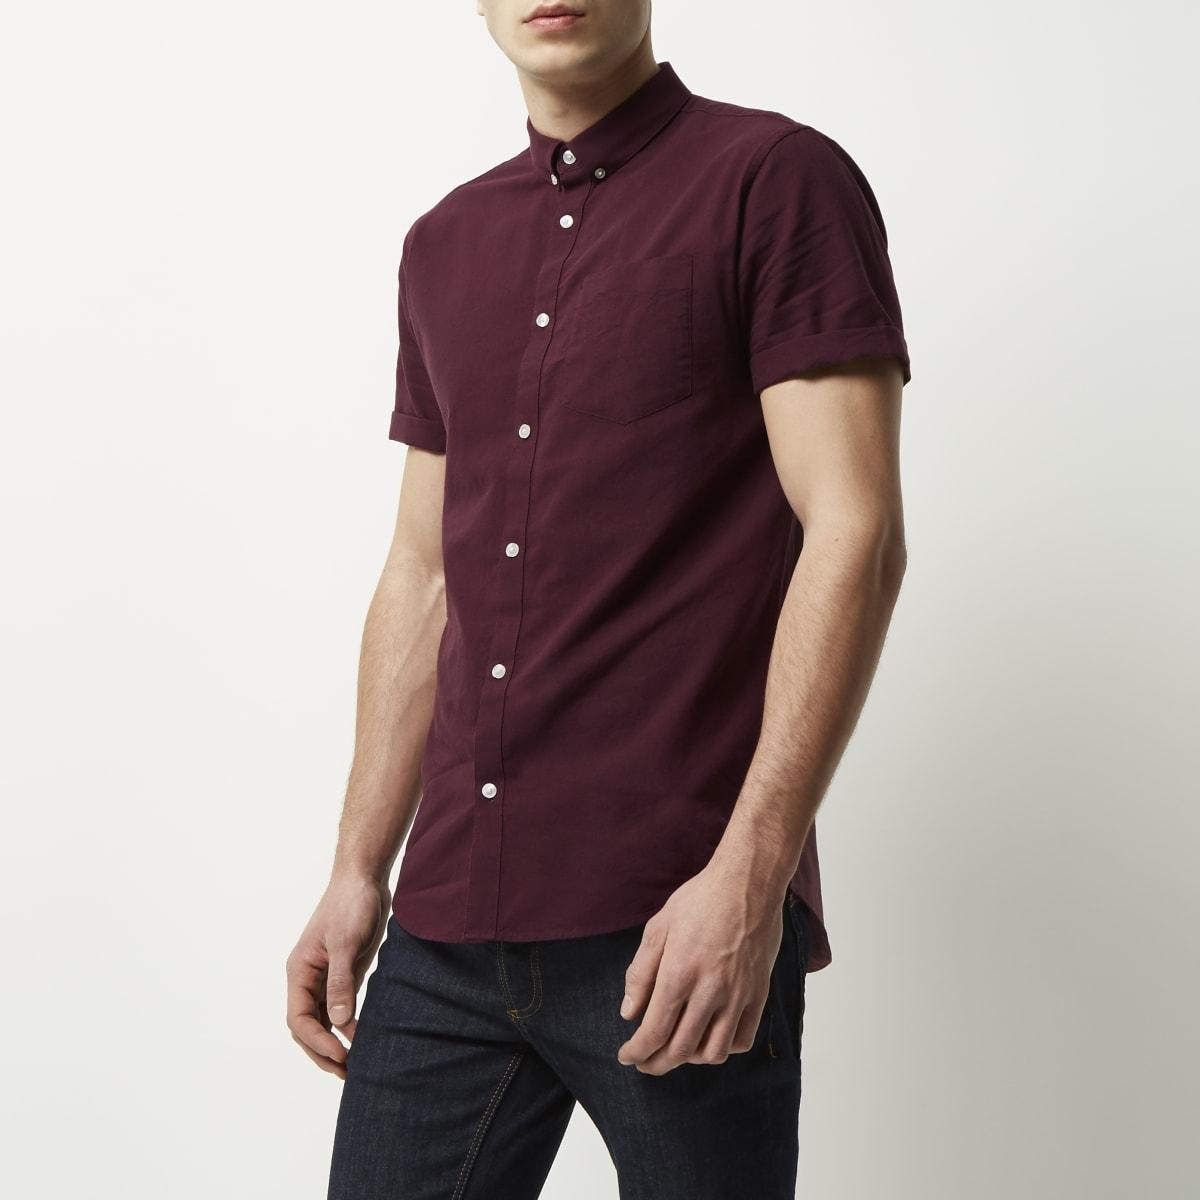 Burgundy short sleeve Oxford shirt